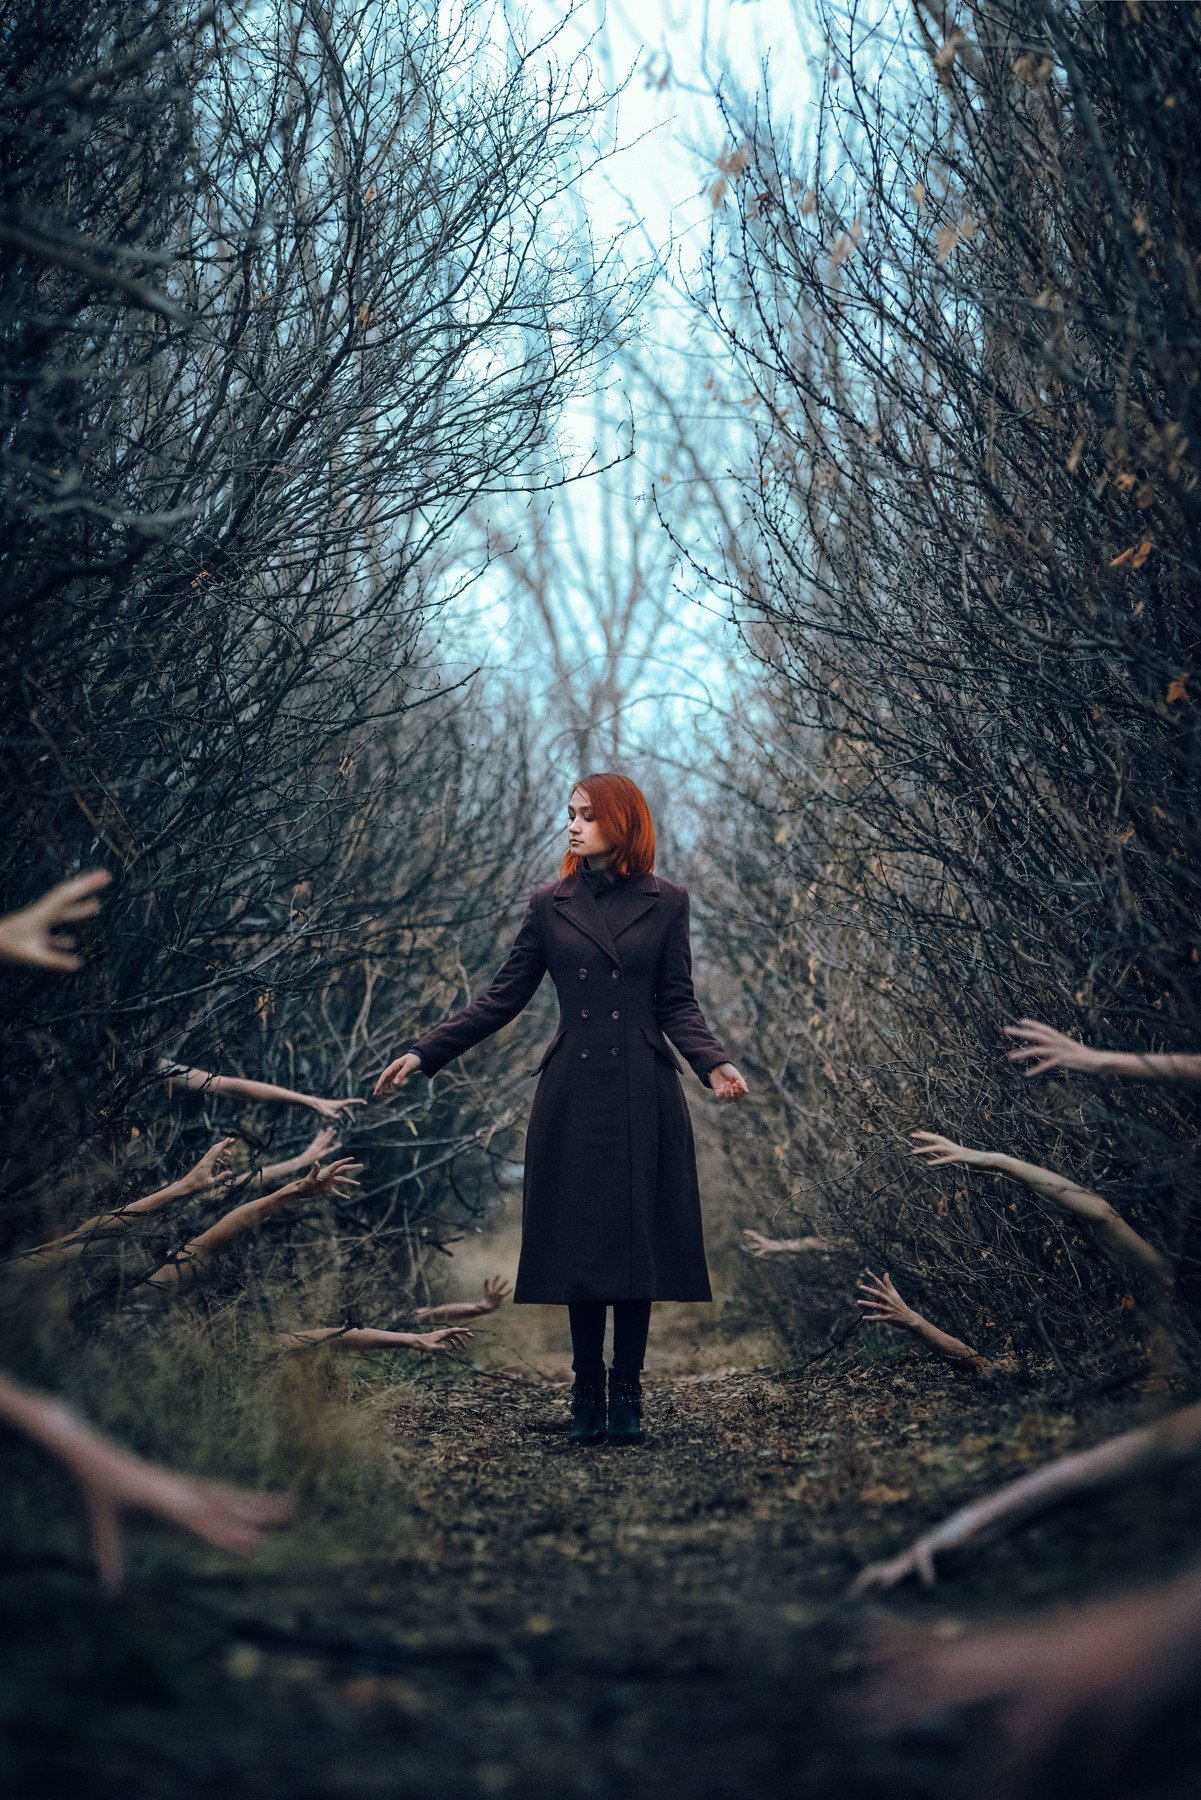 девушка, лес, заросли, тропа, руки, тени, осень, аллея, Логачёв Илья